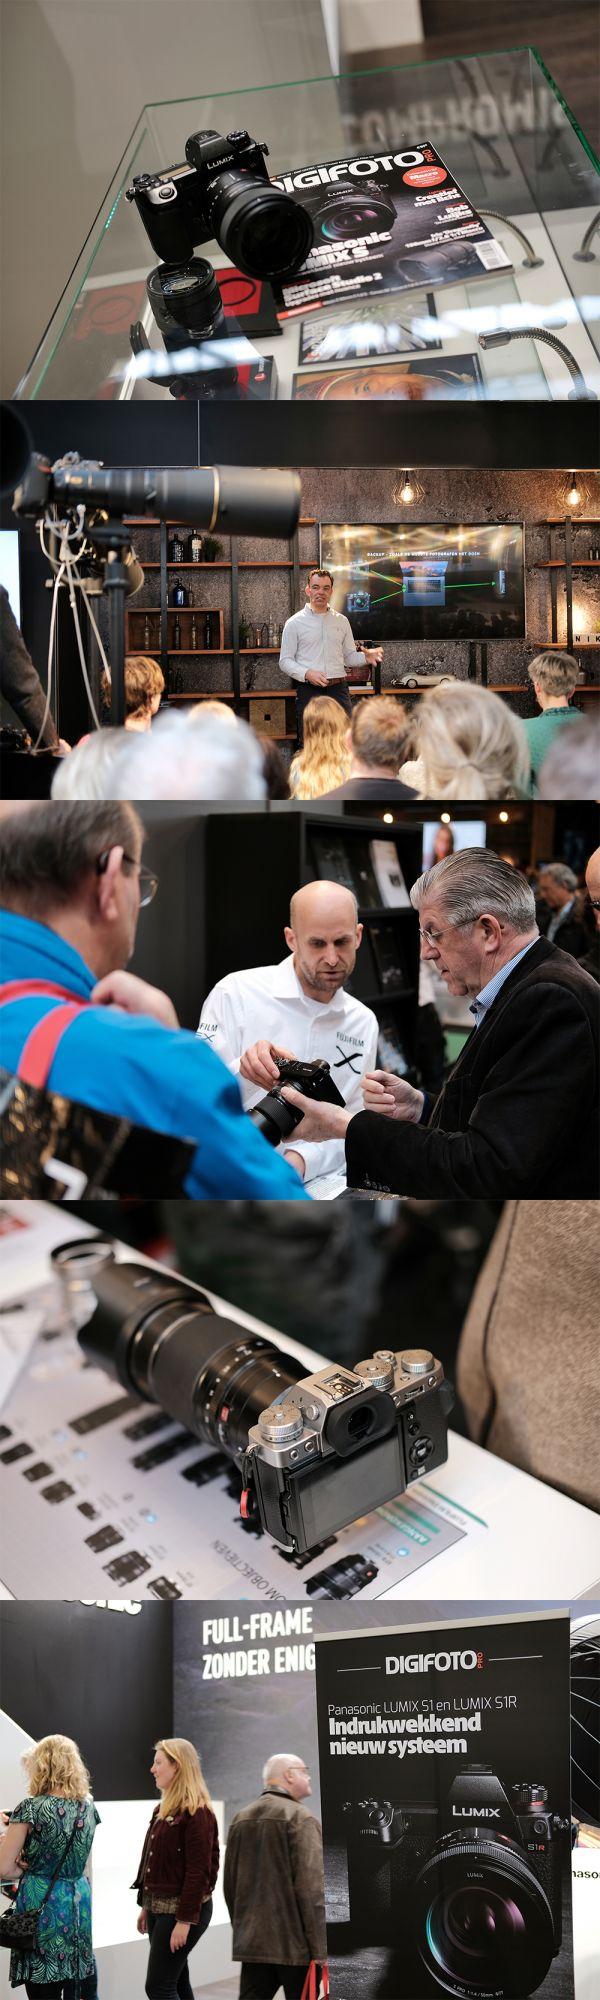 Professional imaging 2019 beurs stand fair loods nijkerk